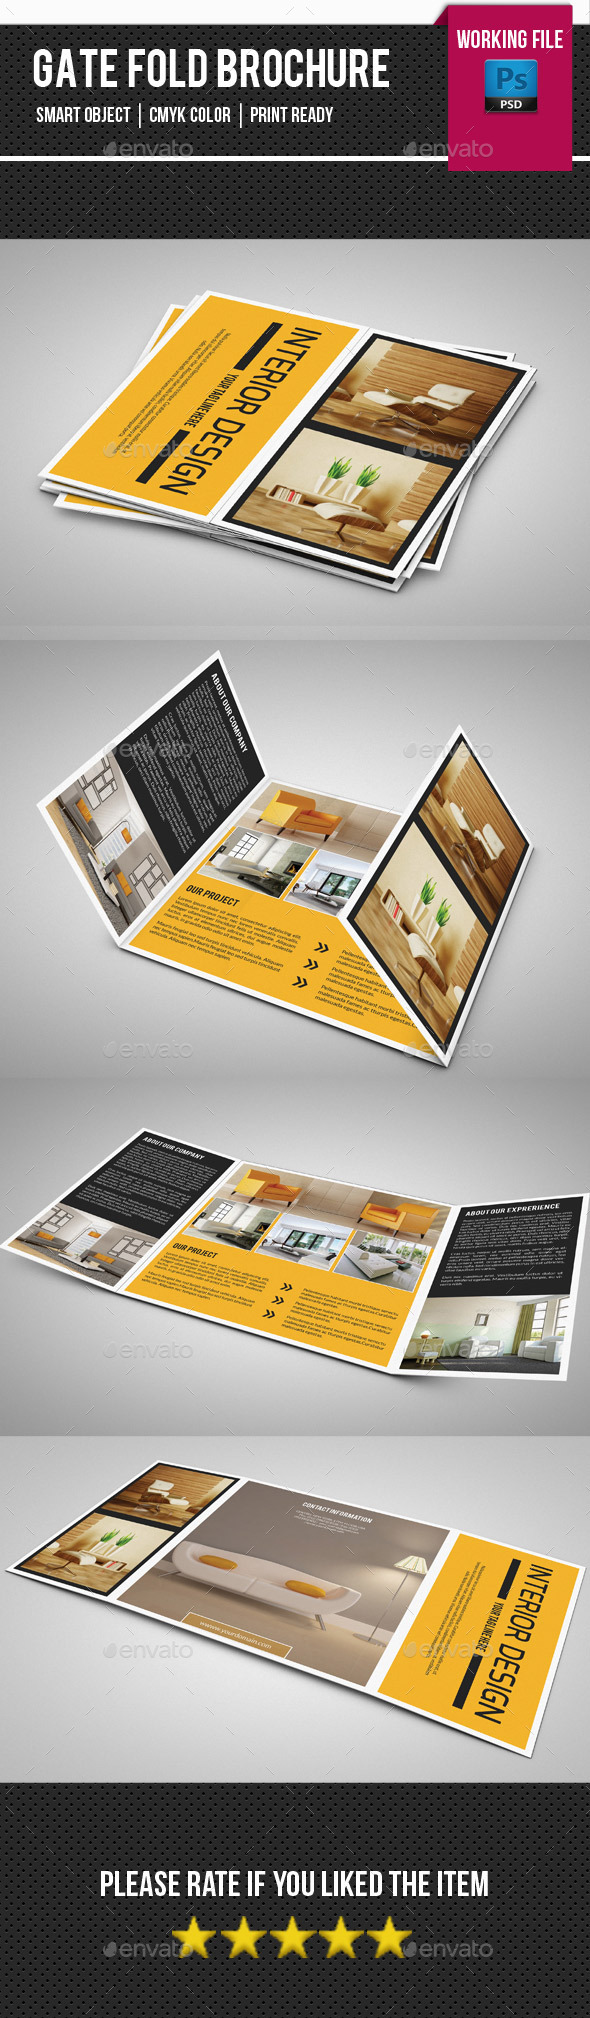 Square Gate fold Interior Brochure-V01 - Corporate Brochures